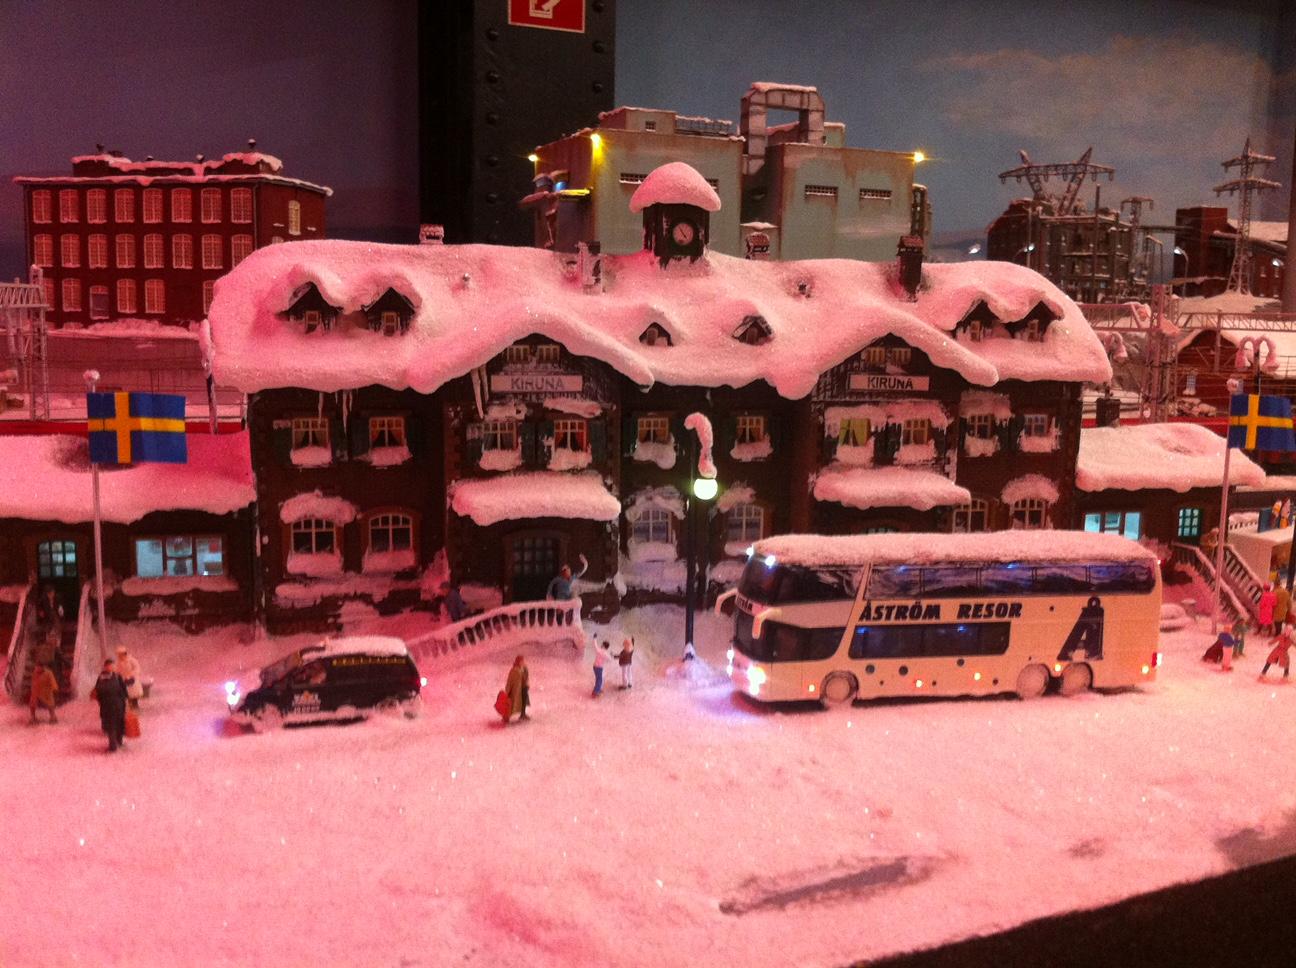 Bahnhof Kiruna im Miniaturwunderland